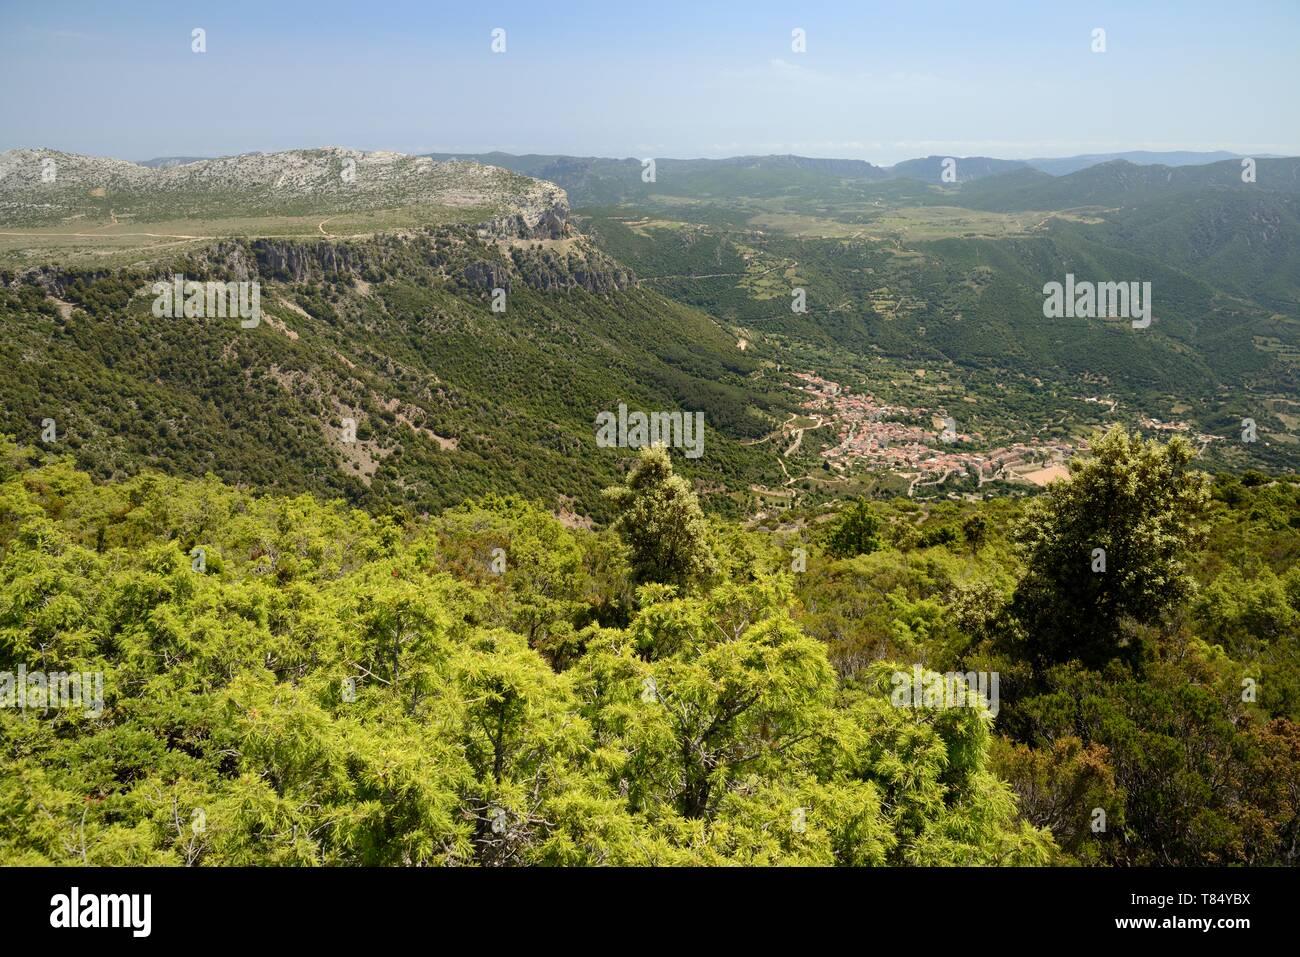 Overview of Urzulei village surrounded by the Supramonte mountain range, Sardinia, Italy, June 2018. - Stock Image